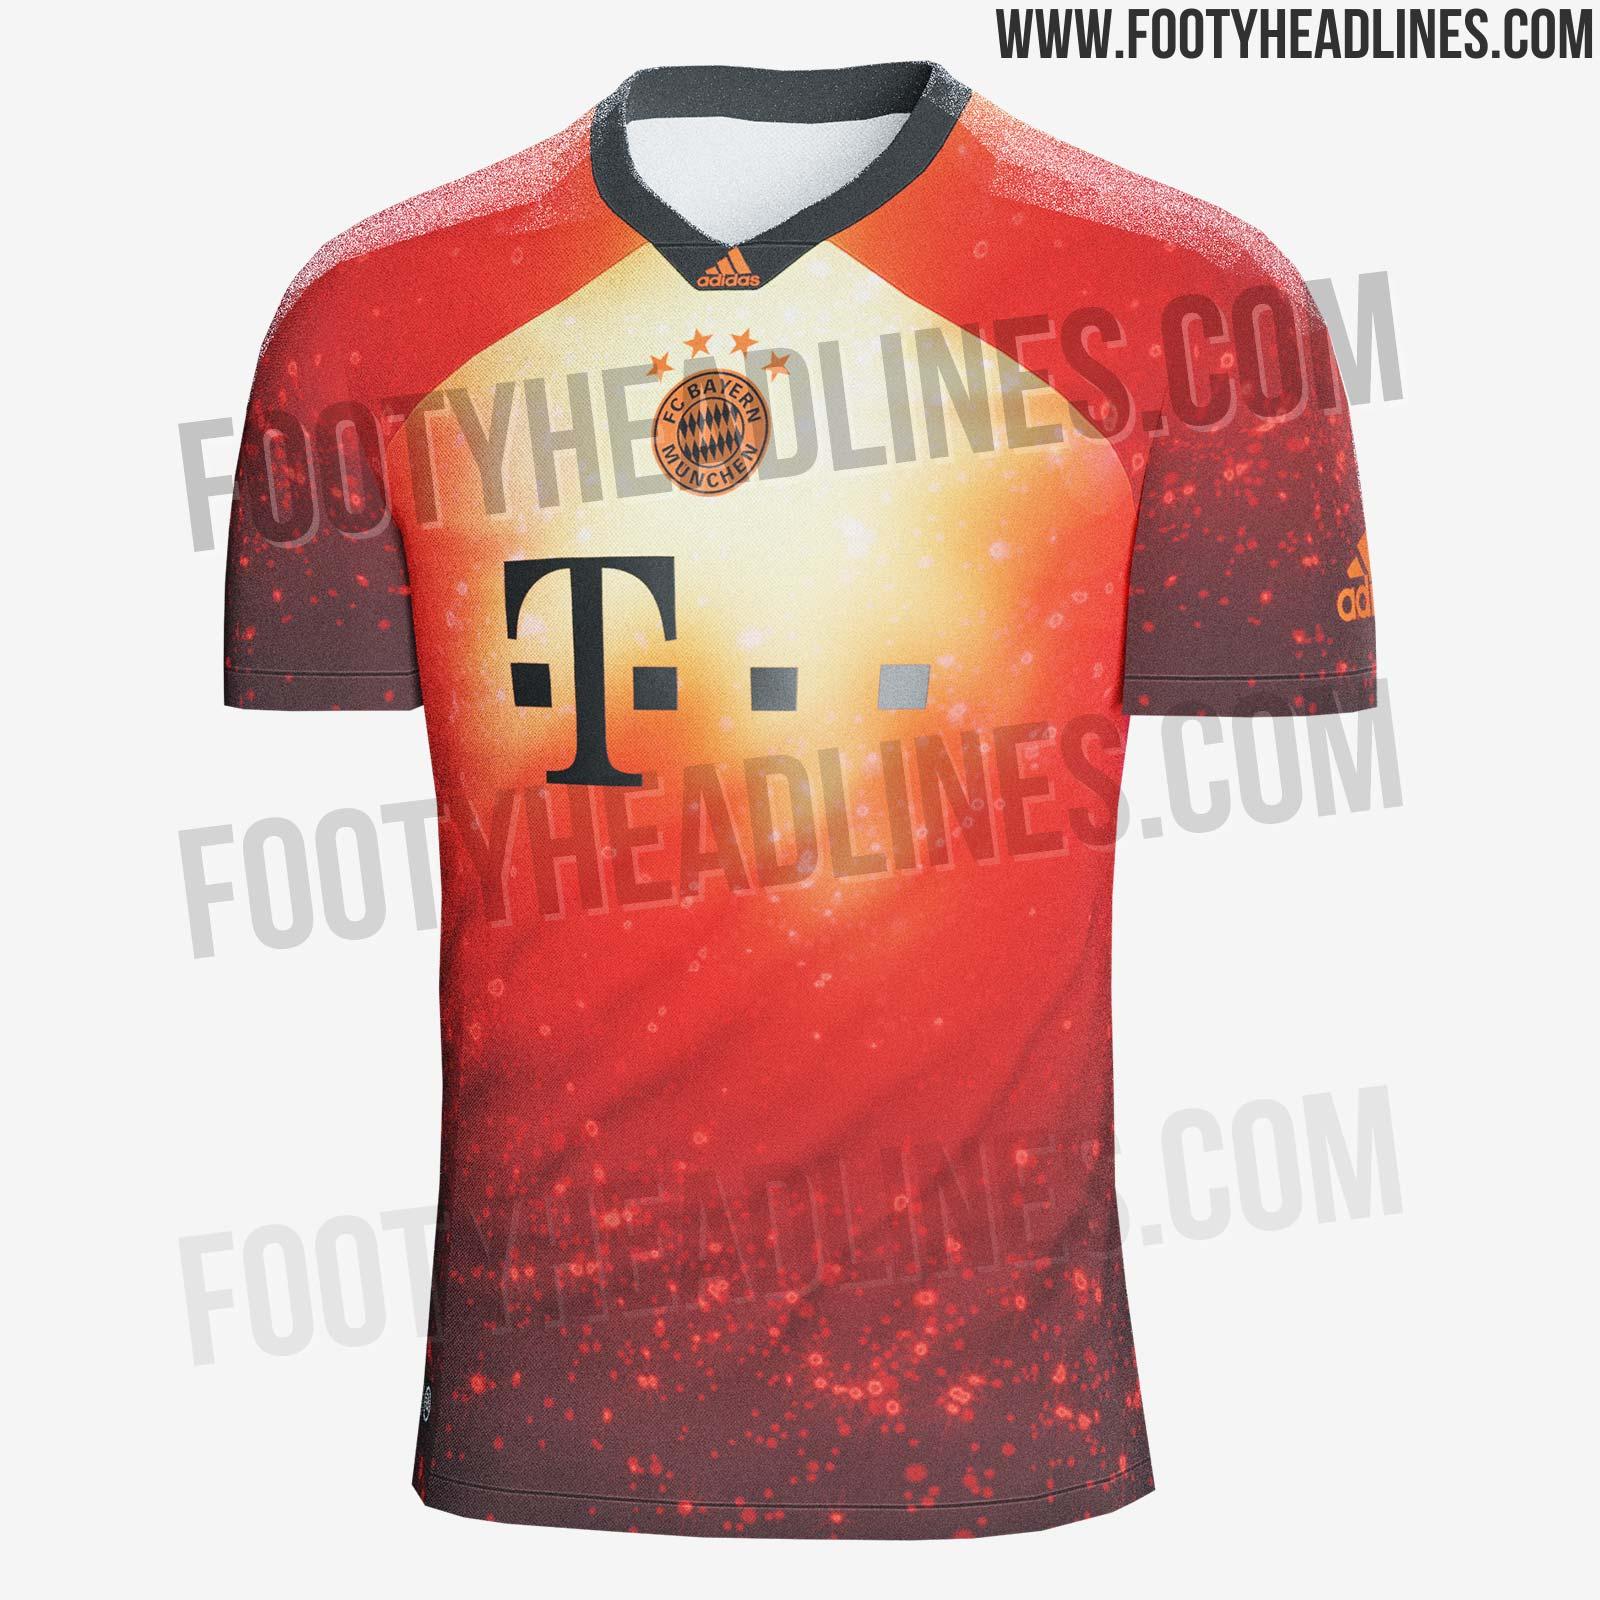 1041dbd1c Exclusive  Insane Adidas x EA Sports Bayern München Shirt Leaked ...